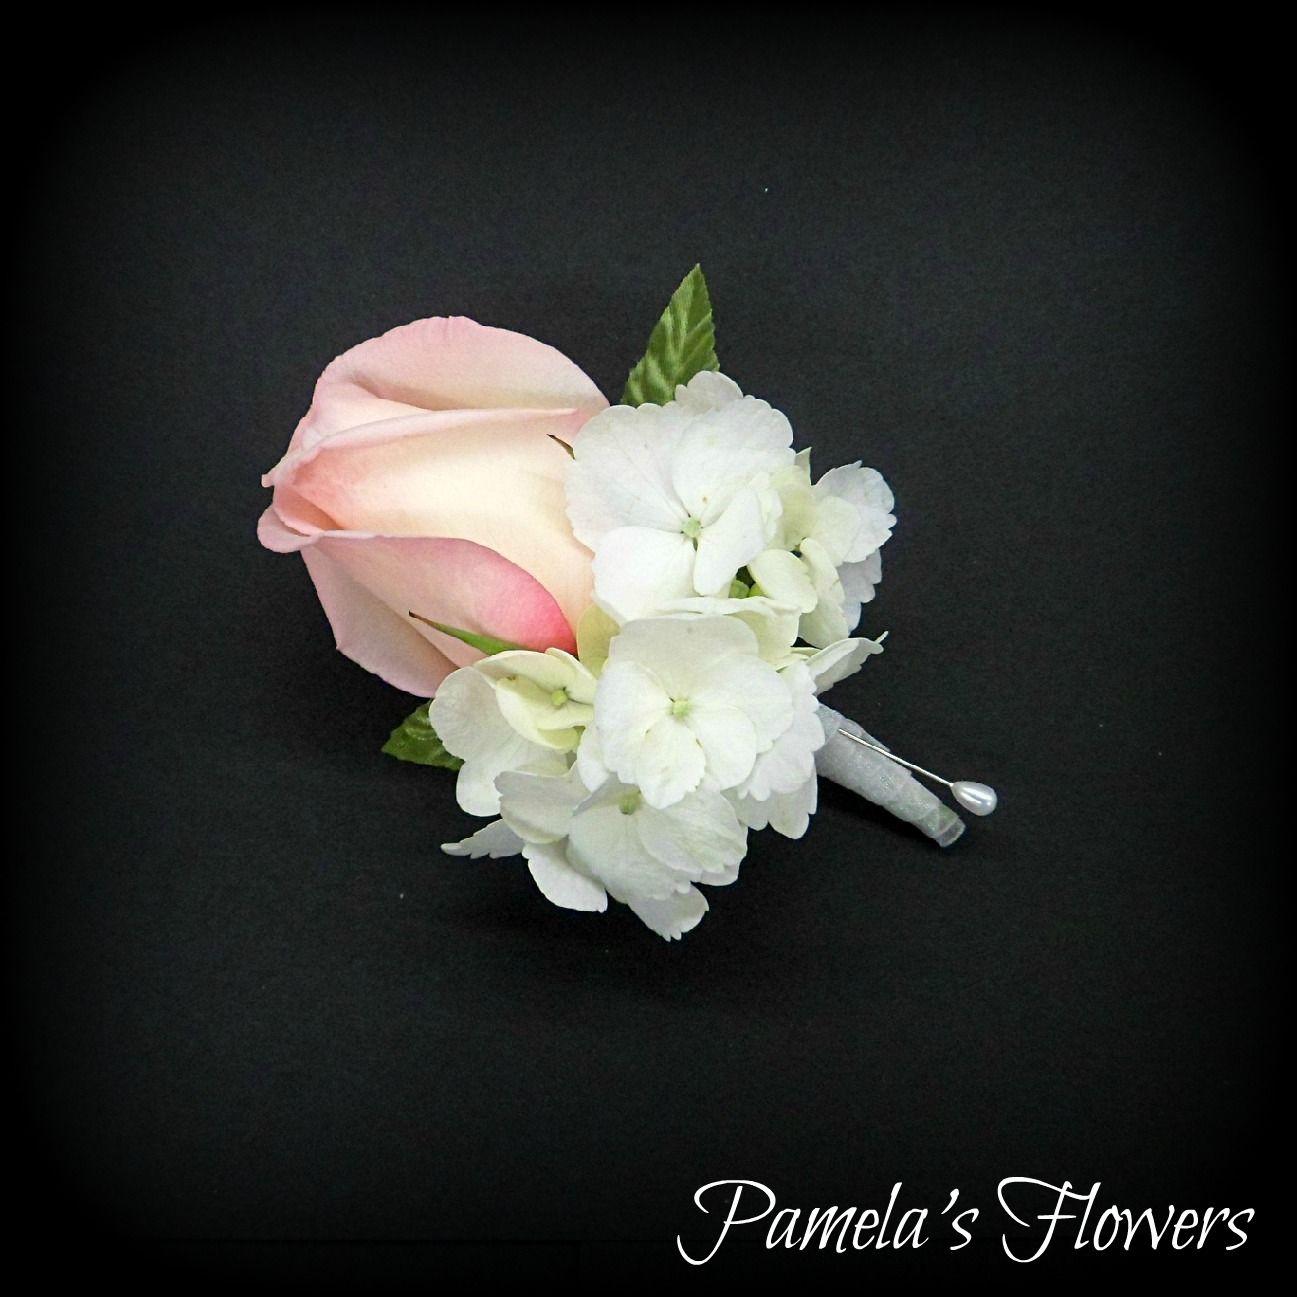 Weddings Pamela S Flowers Enola Pa 17025 Wedding Party Flowers Flower Delivery Service Light Pink Rose